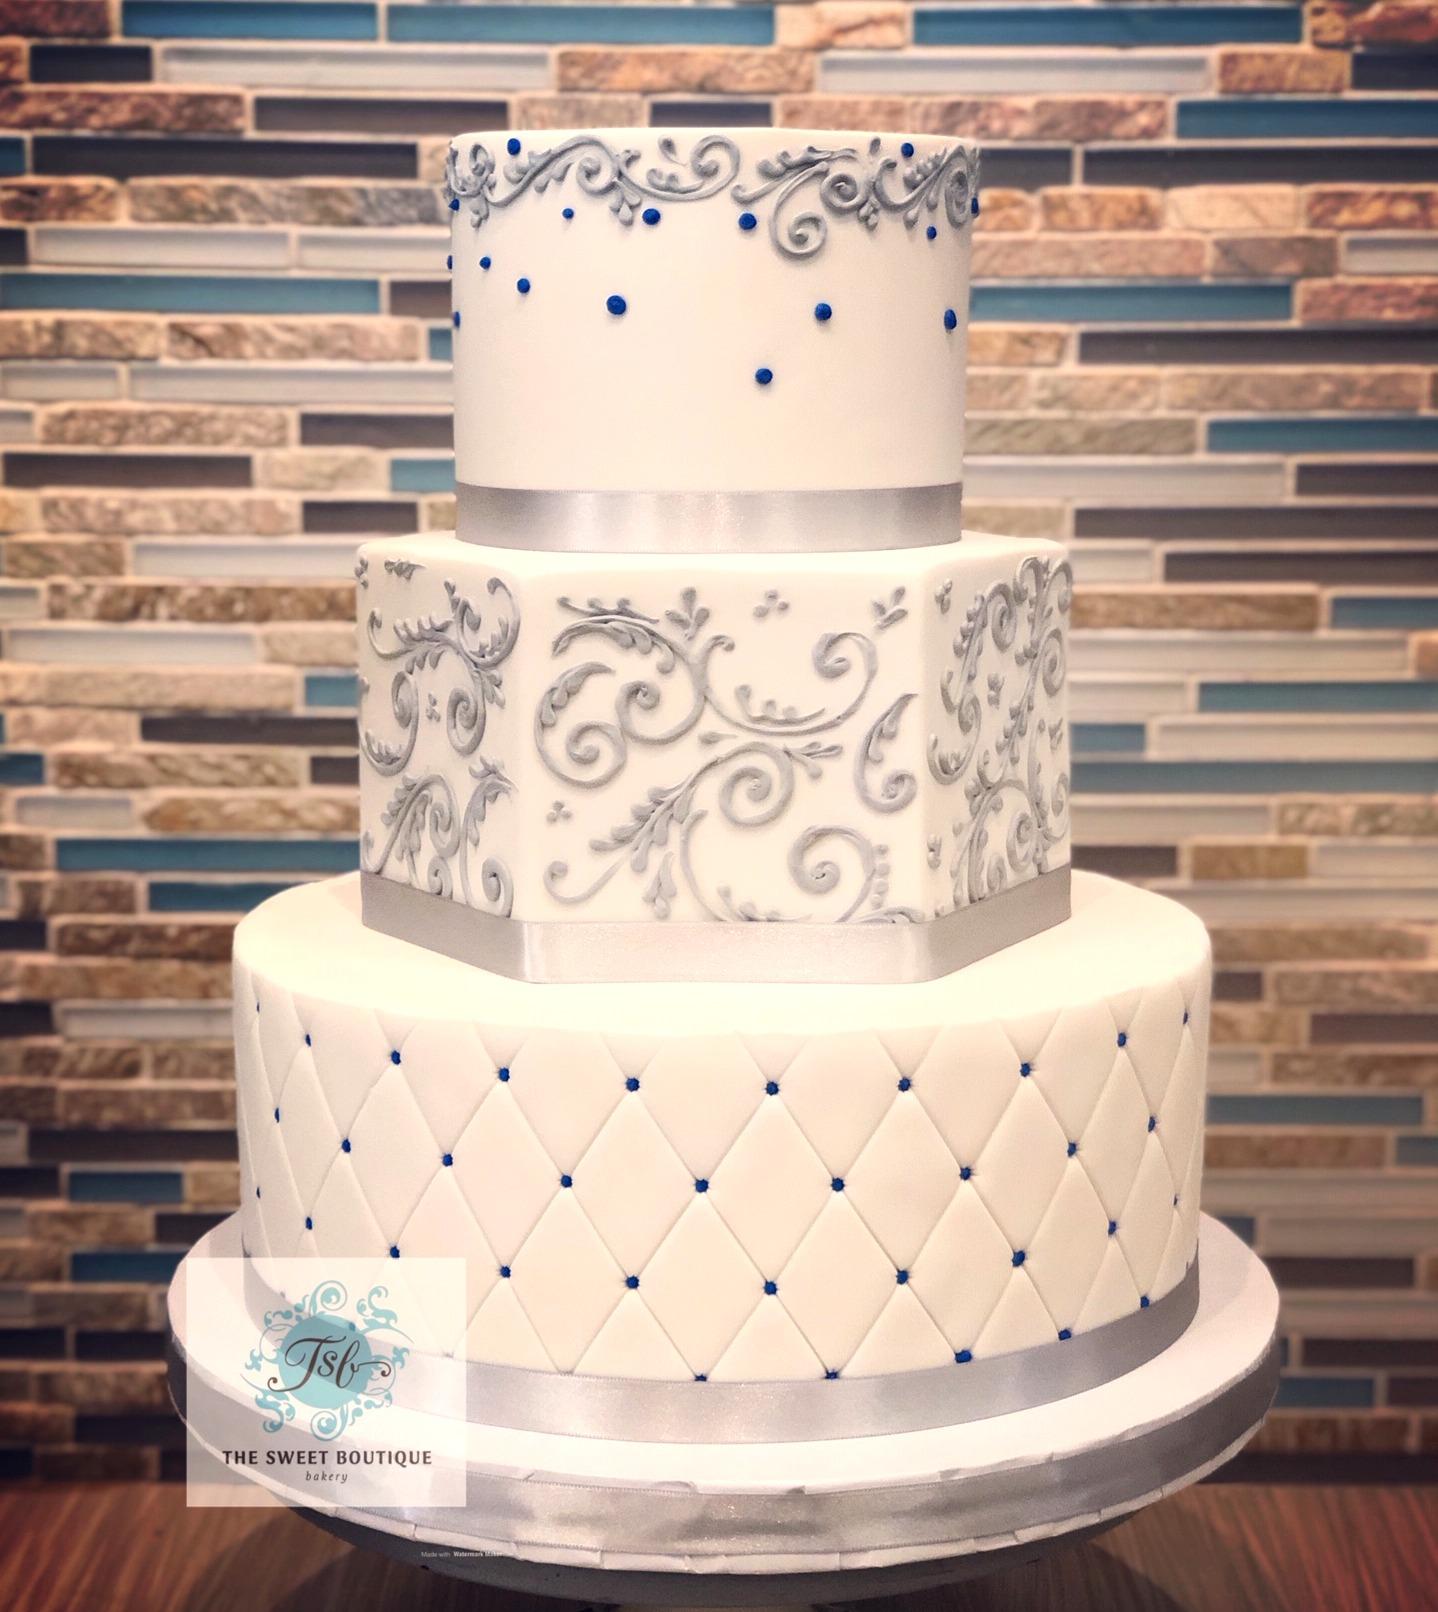 Scroll/Quilt Pattern Wedding Cake